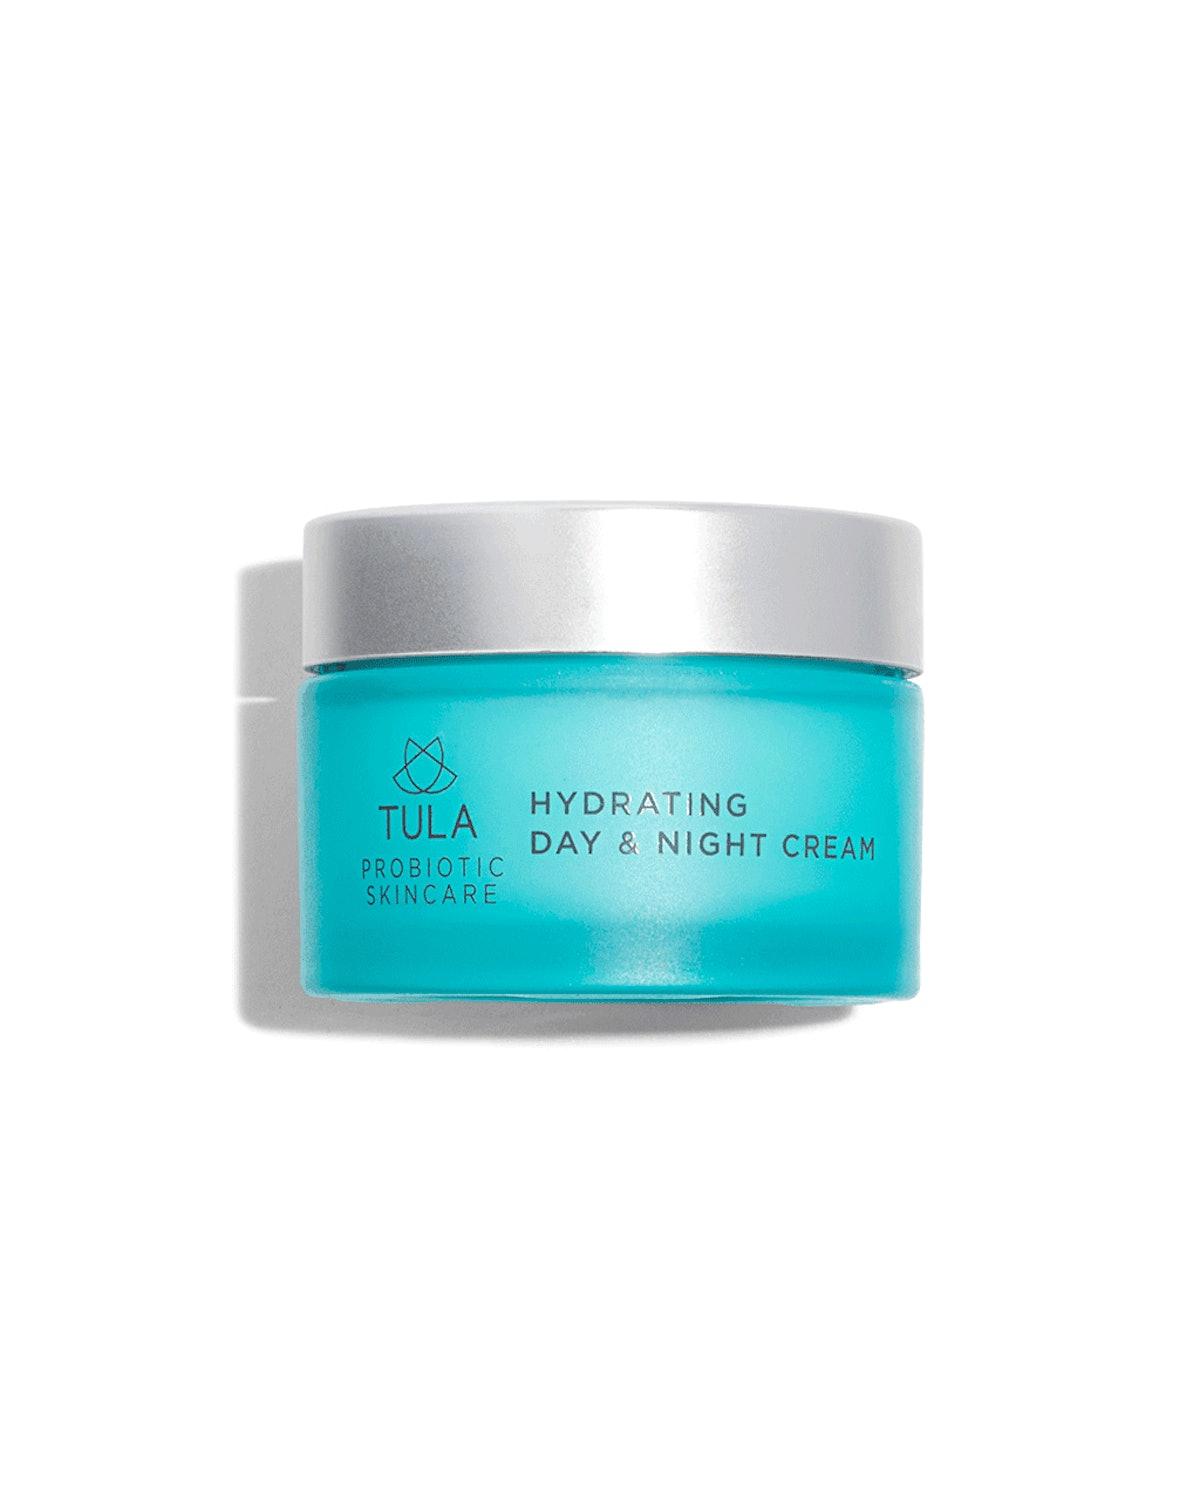 Tula Hydrating Day & Night Cream